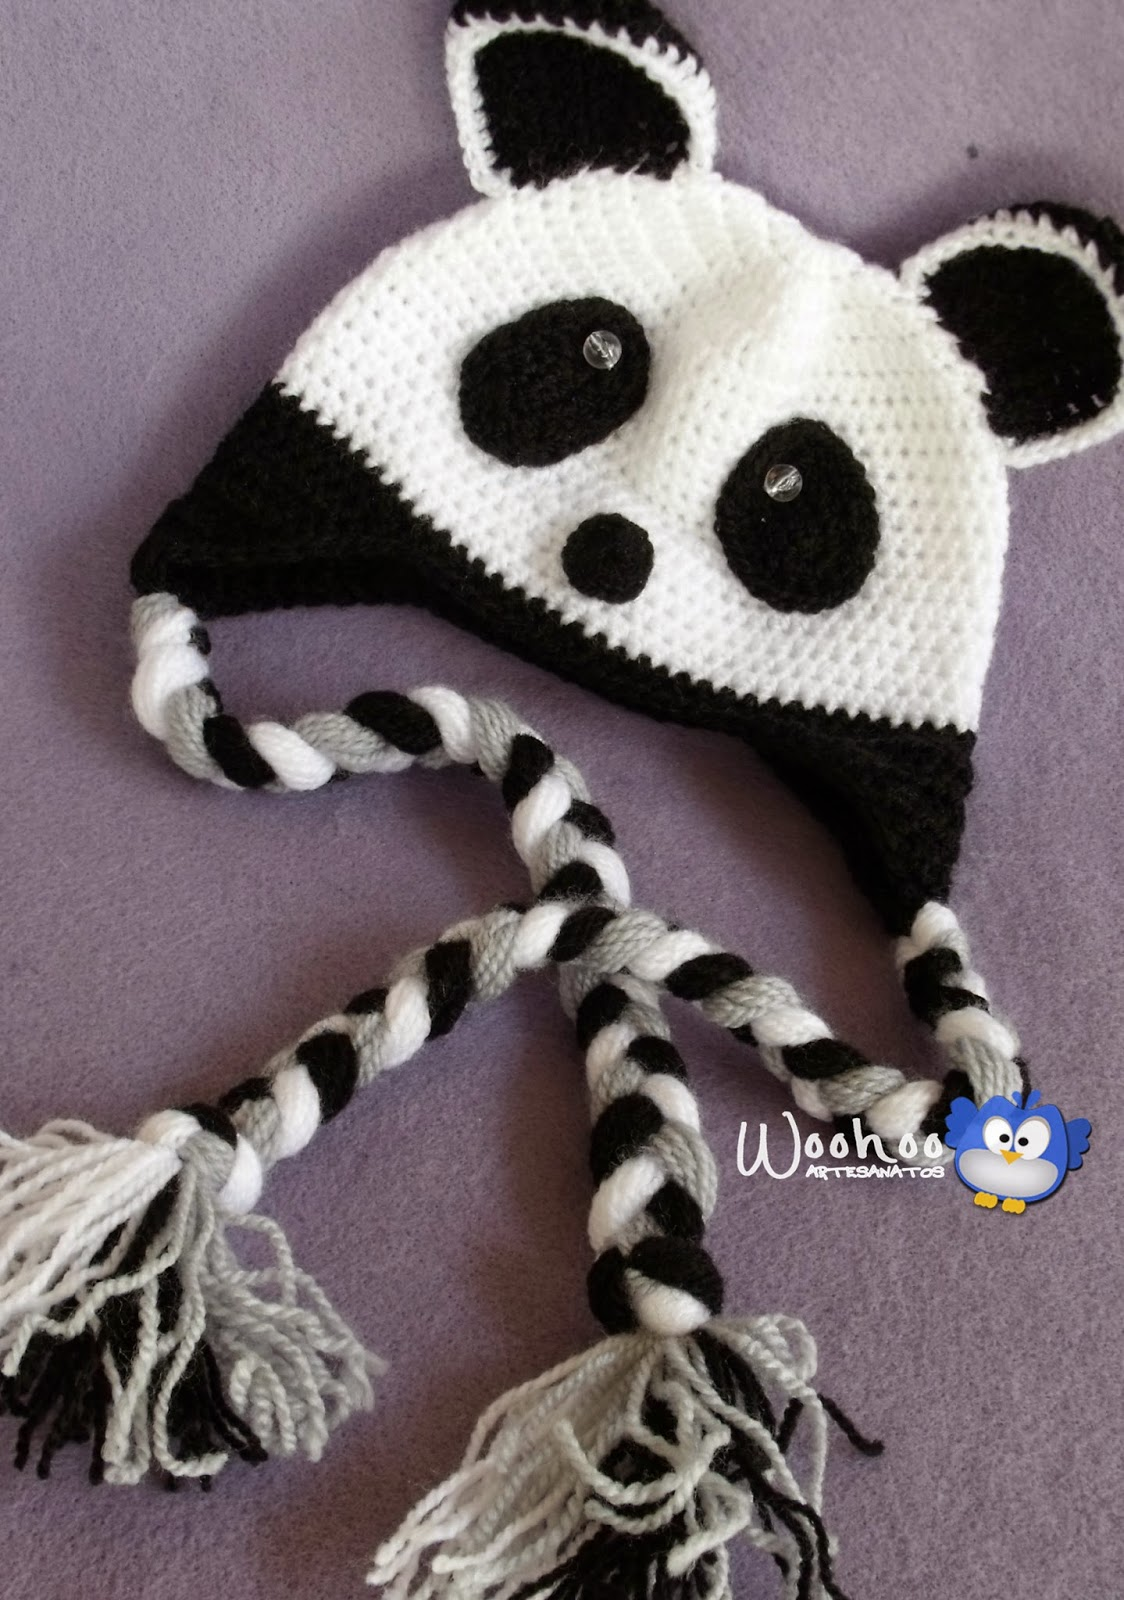 WooHoo Artesanatos  Touca Infantil Ursinho Panda 1bc2181937a